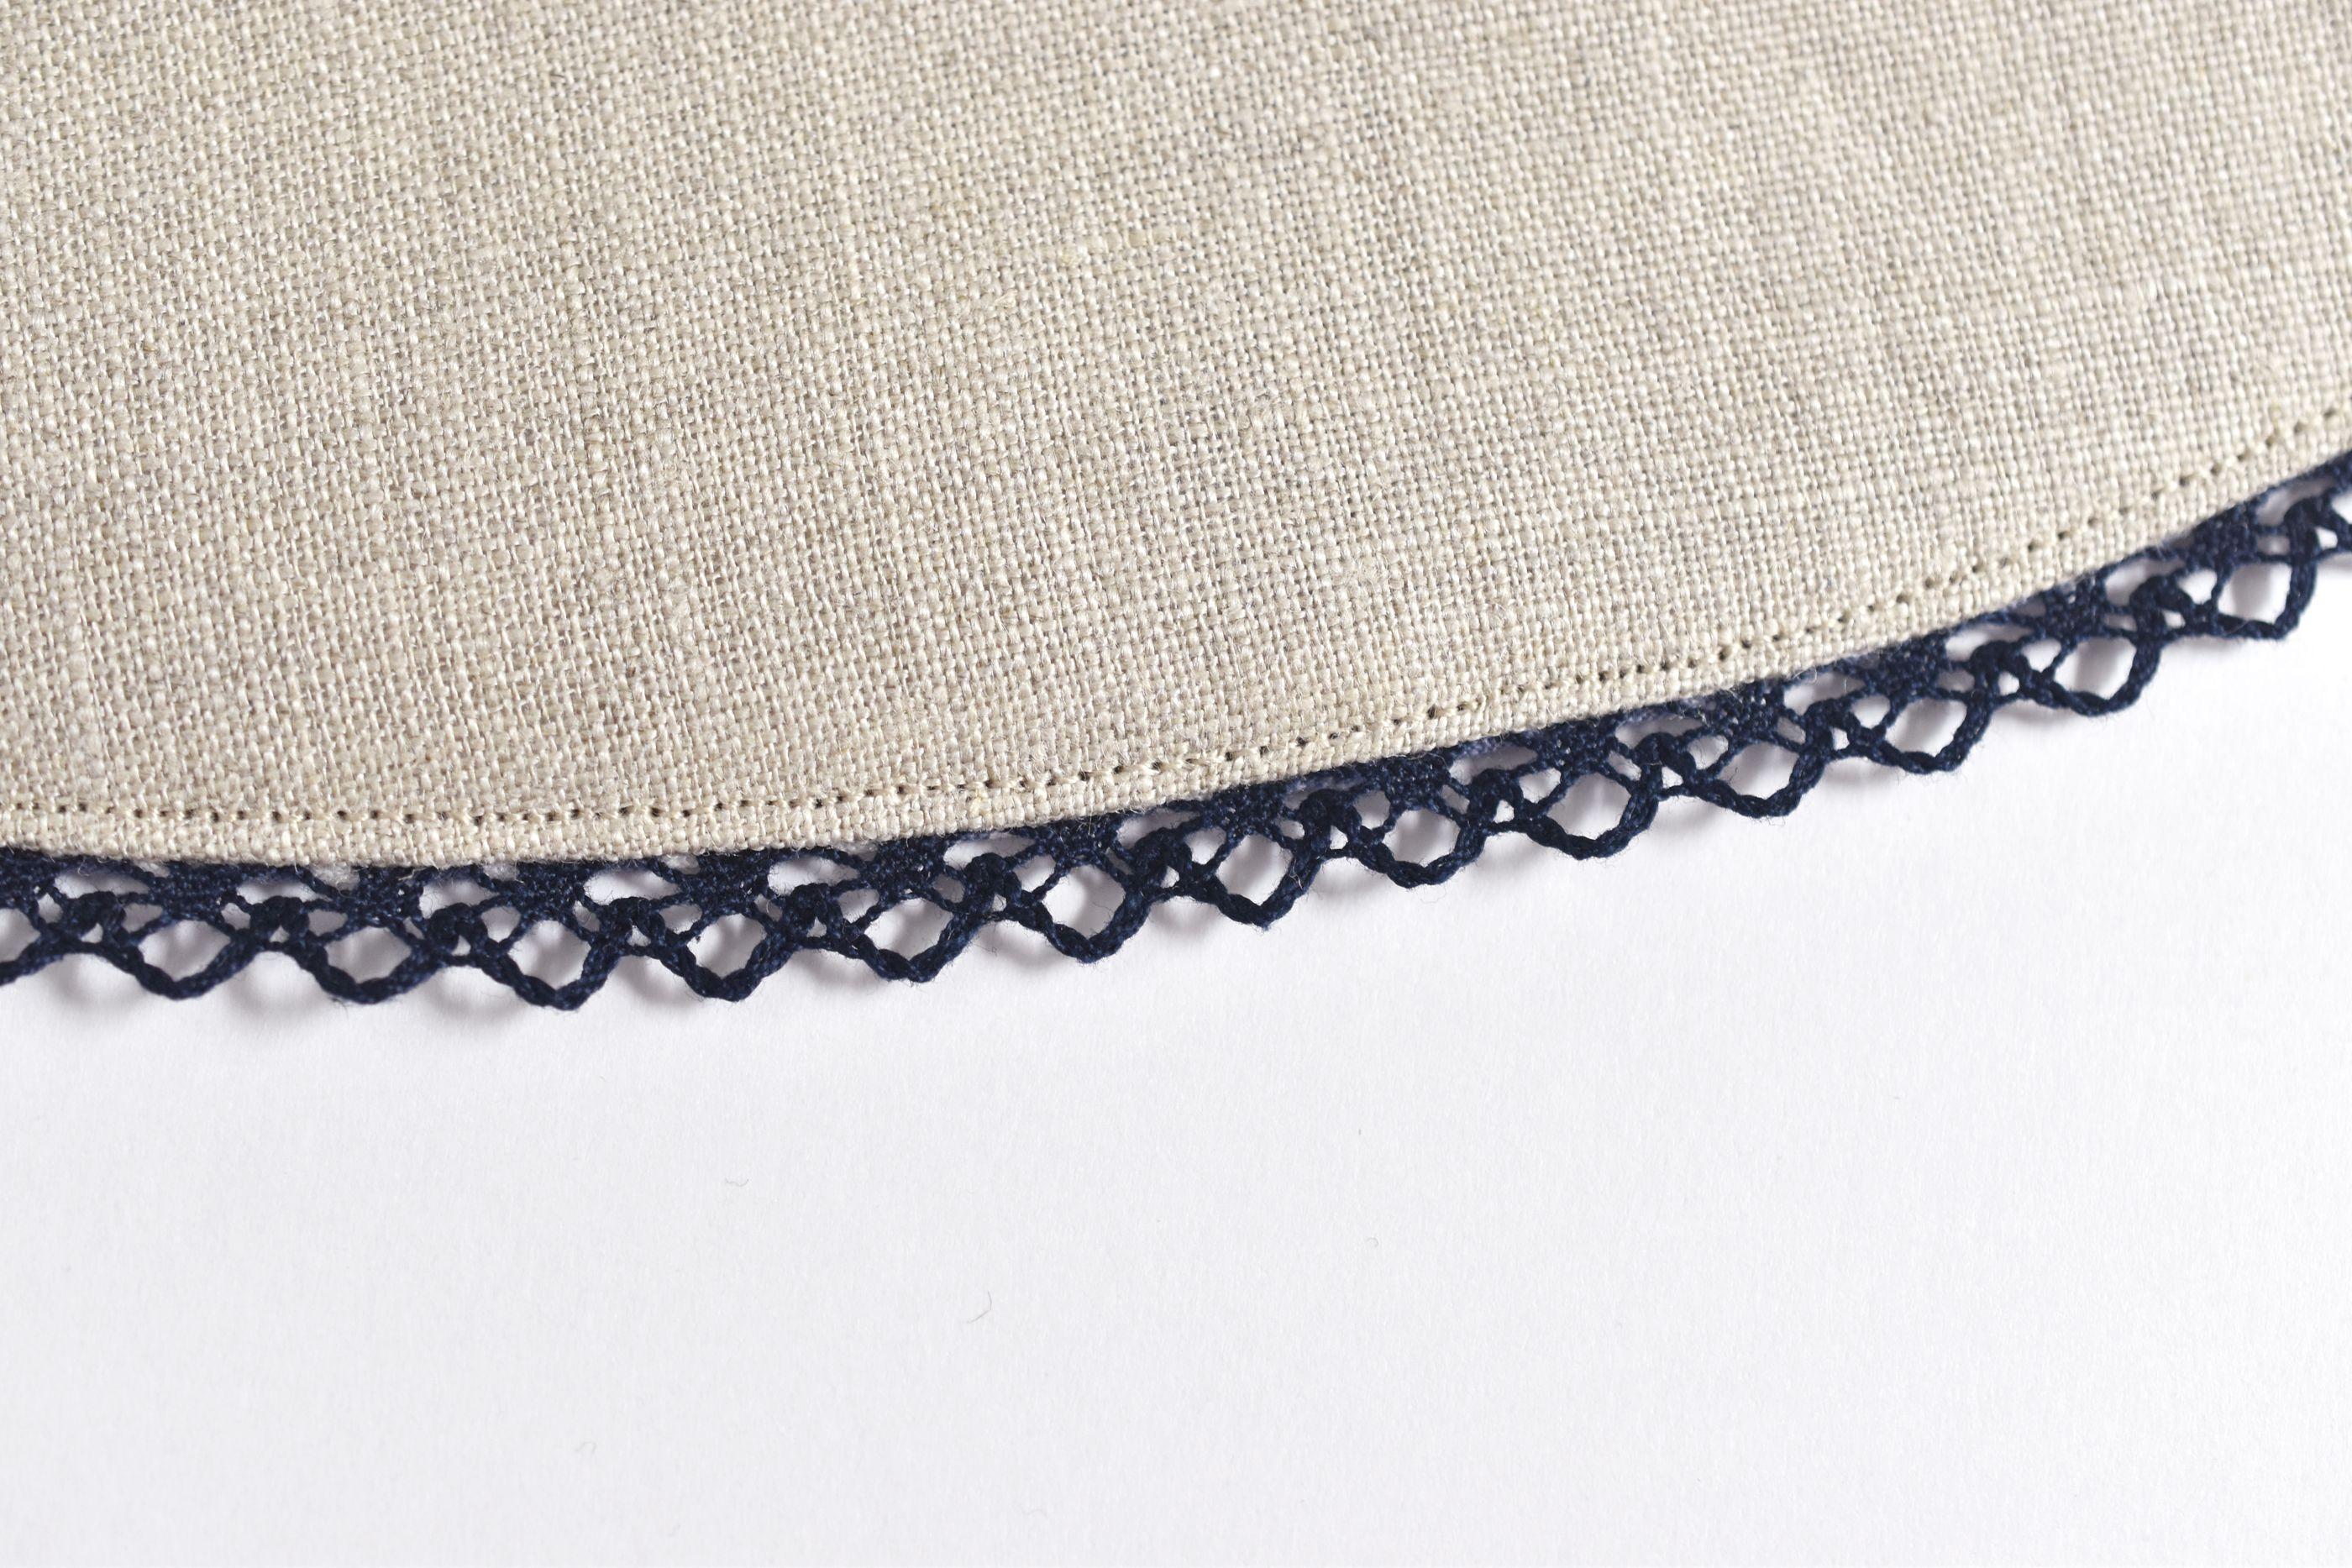 Closeup of hat brim showing top-stitching